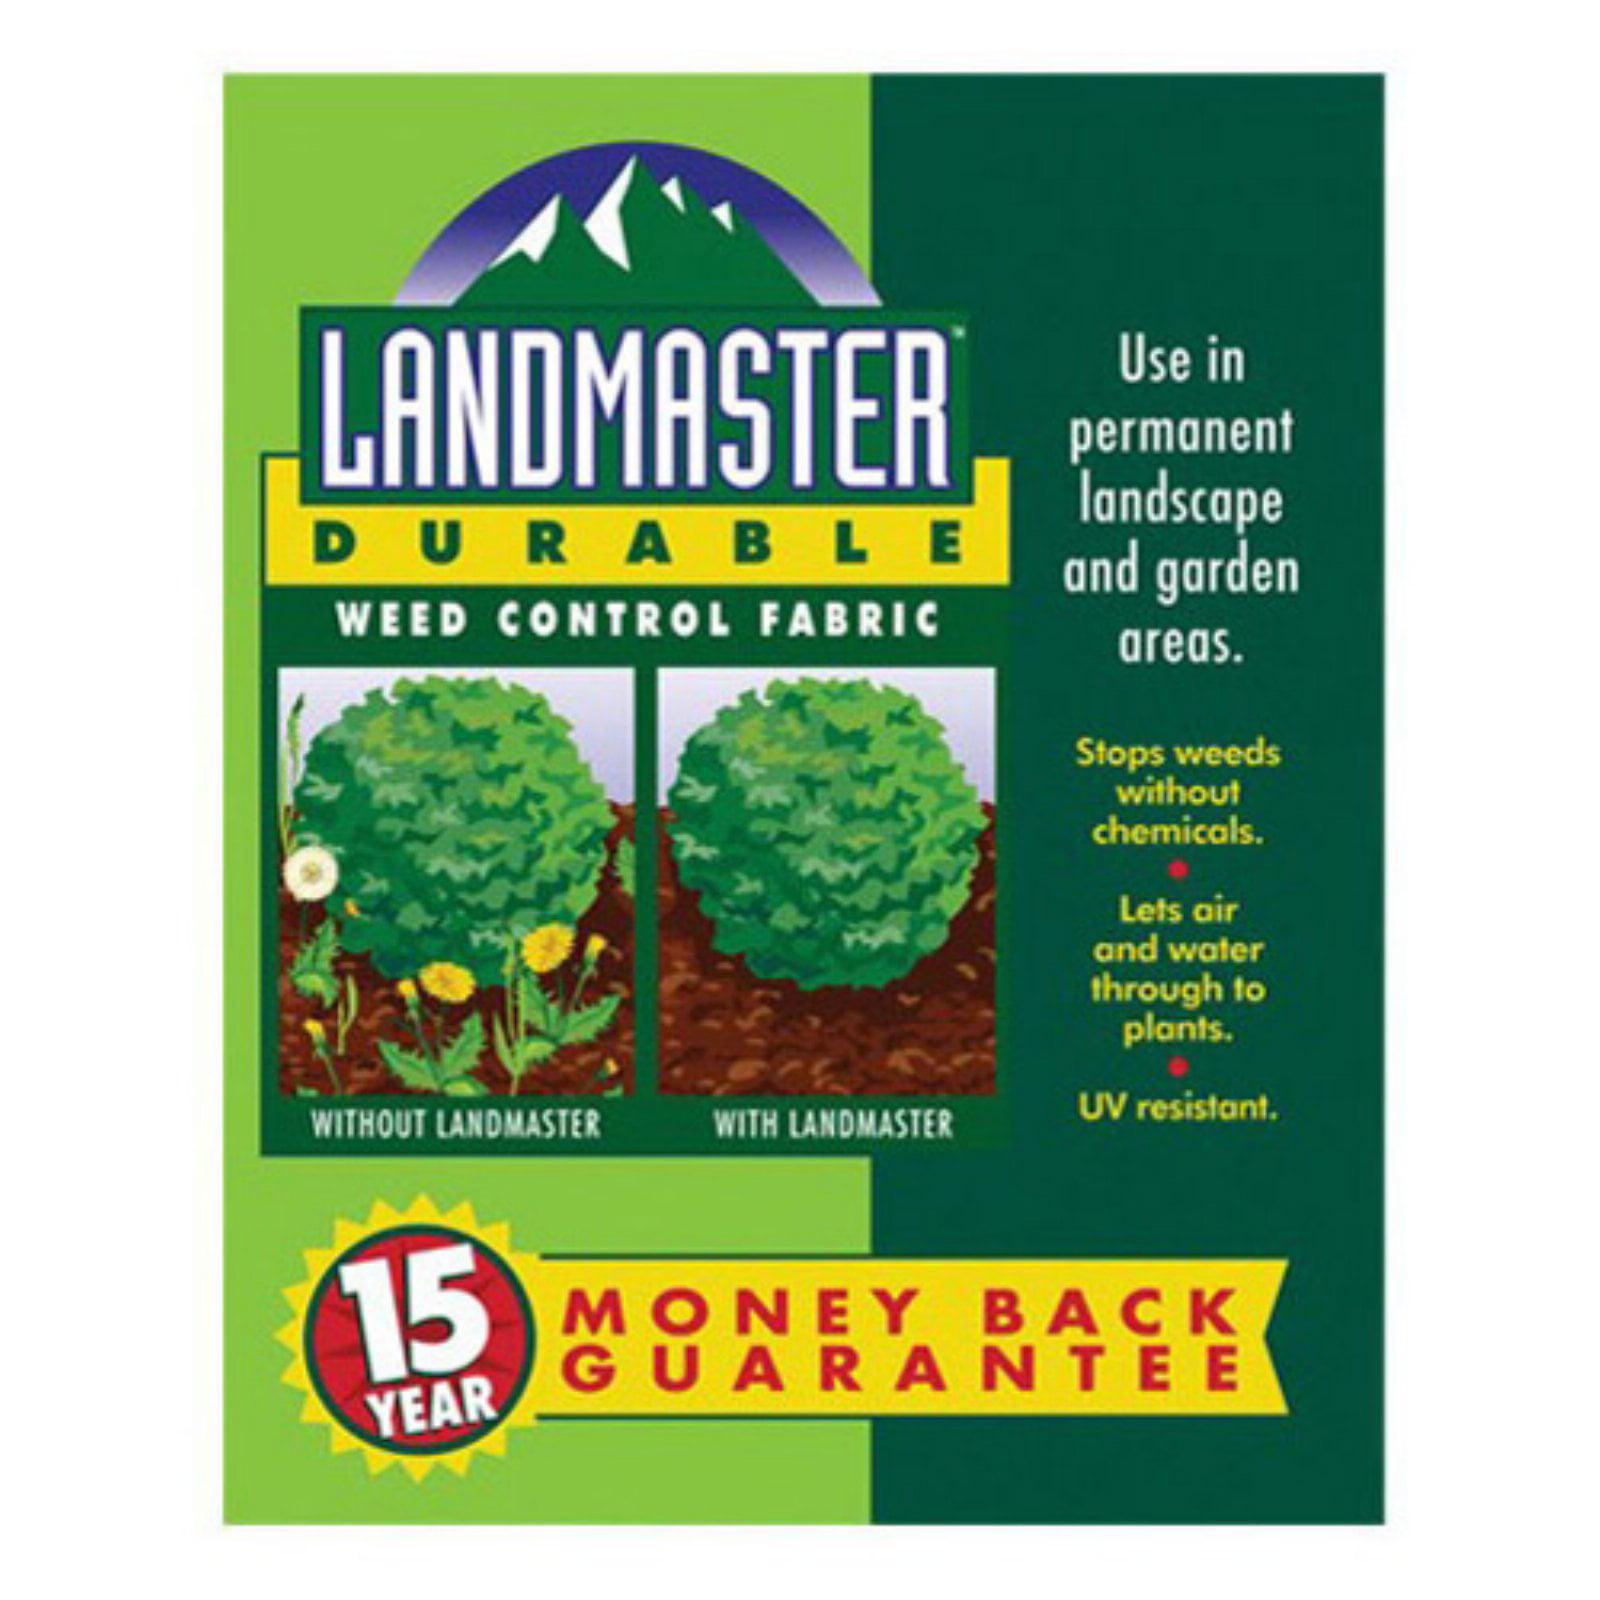 Easy Gardener Landmaster Durable Weed Control Fabric